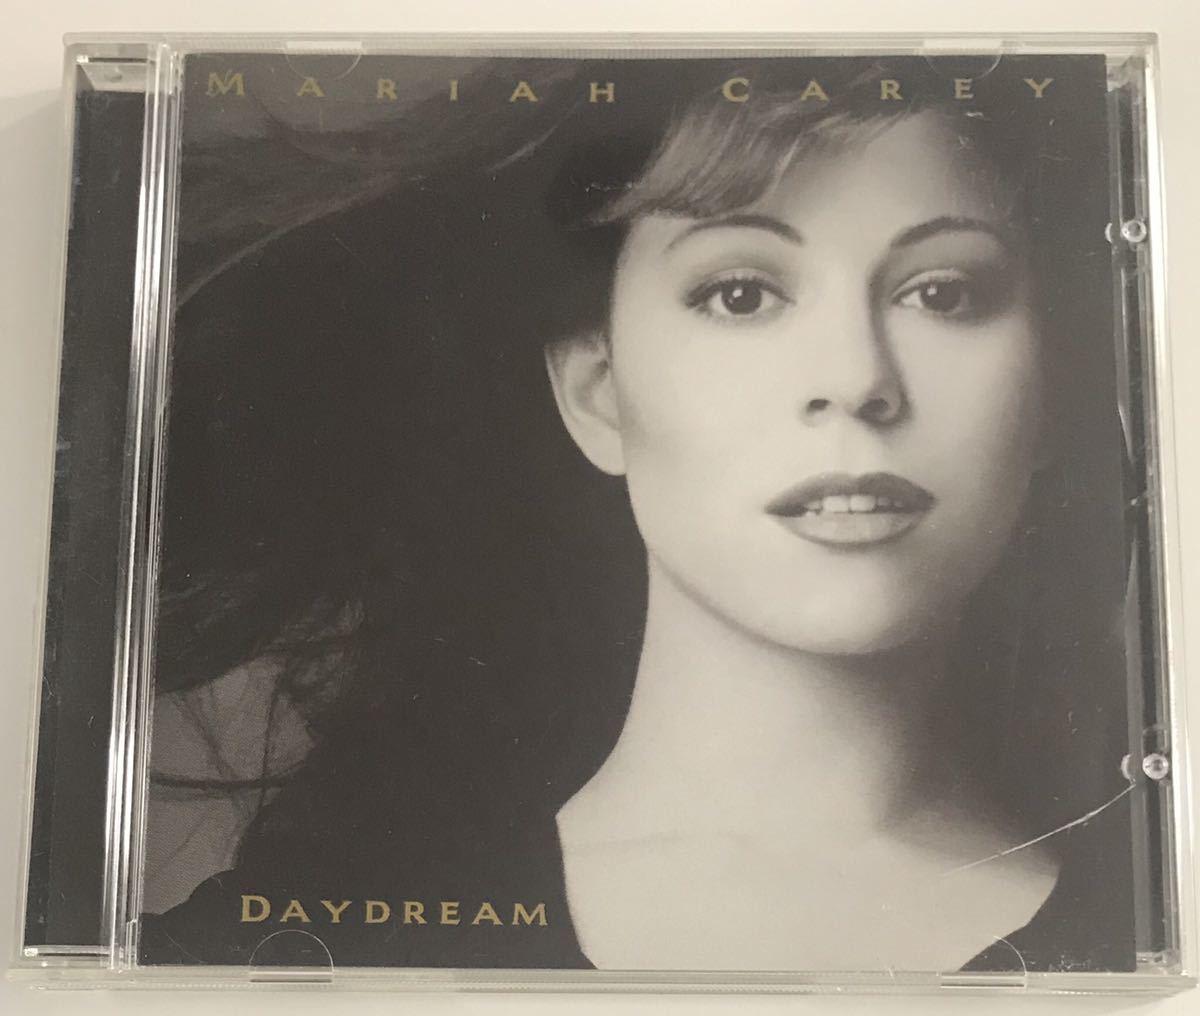 Mariah Carey CD「DAYDREAM」マライアキャリー